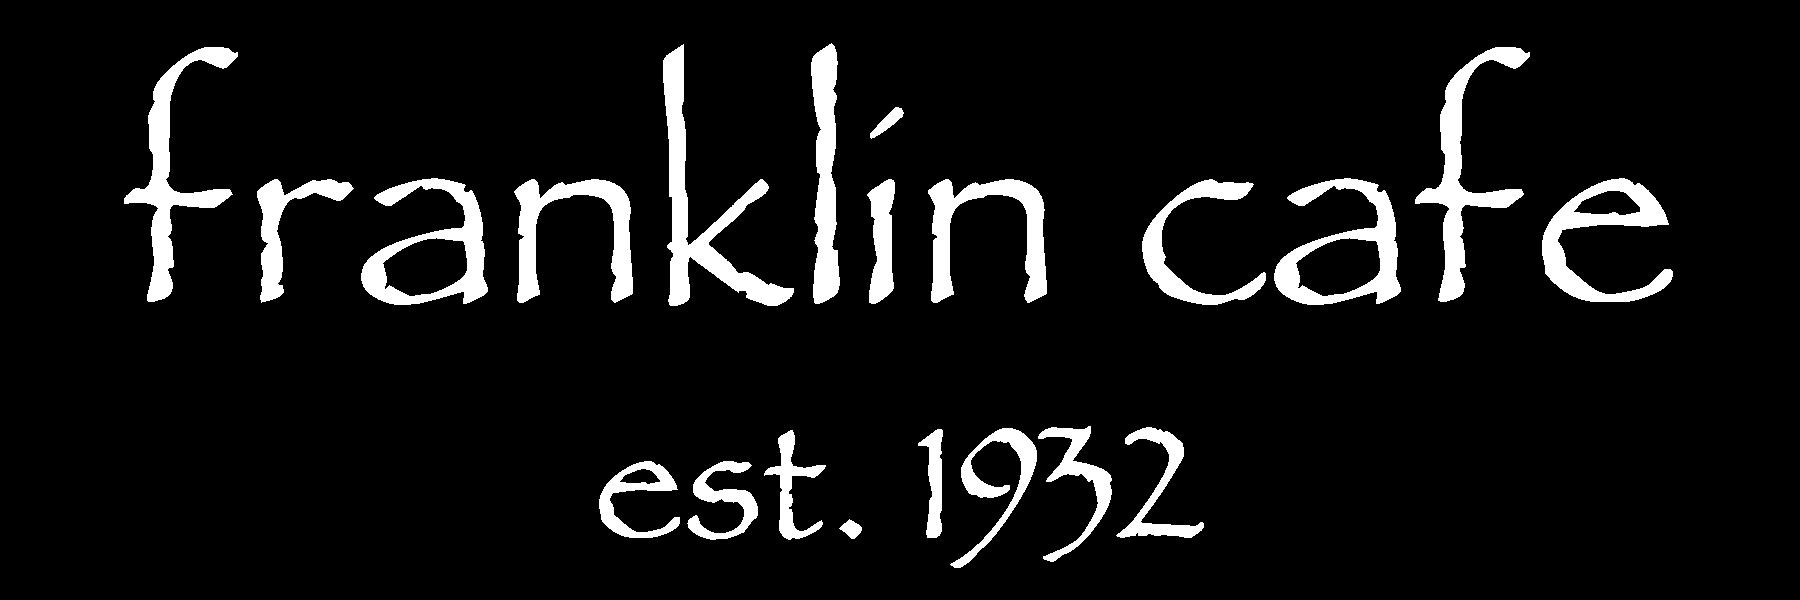 The Franklin Cafe Home